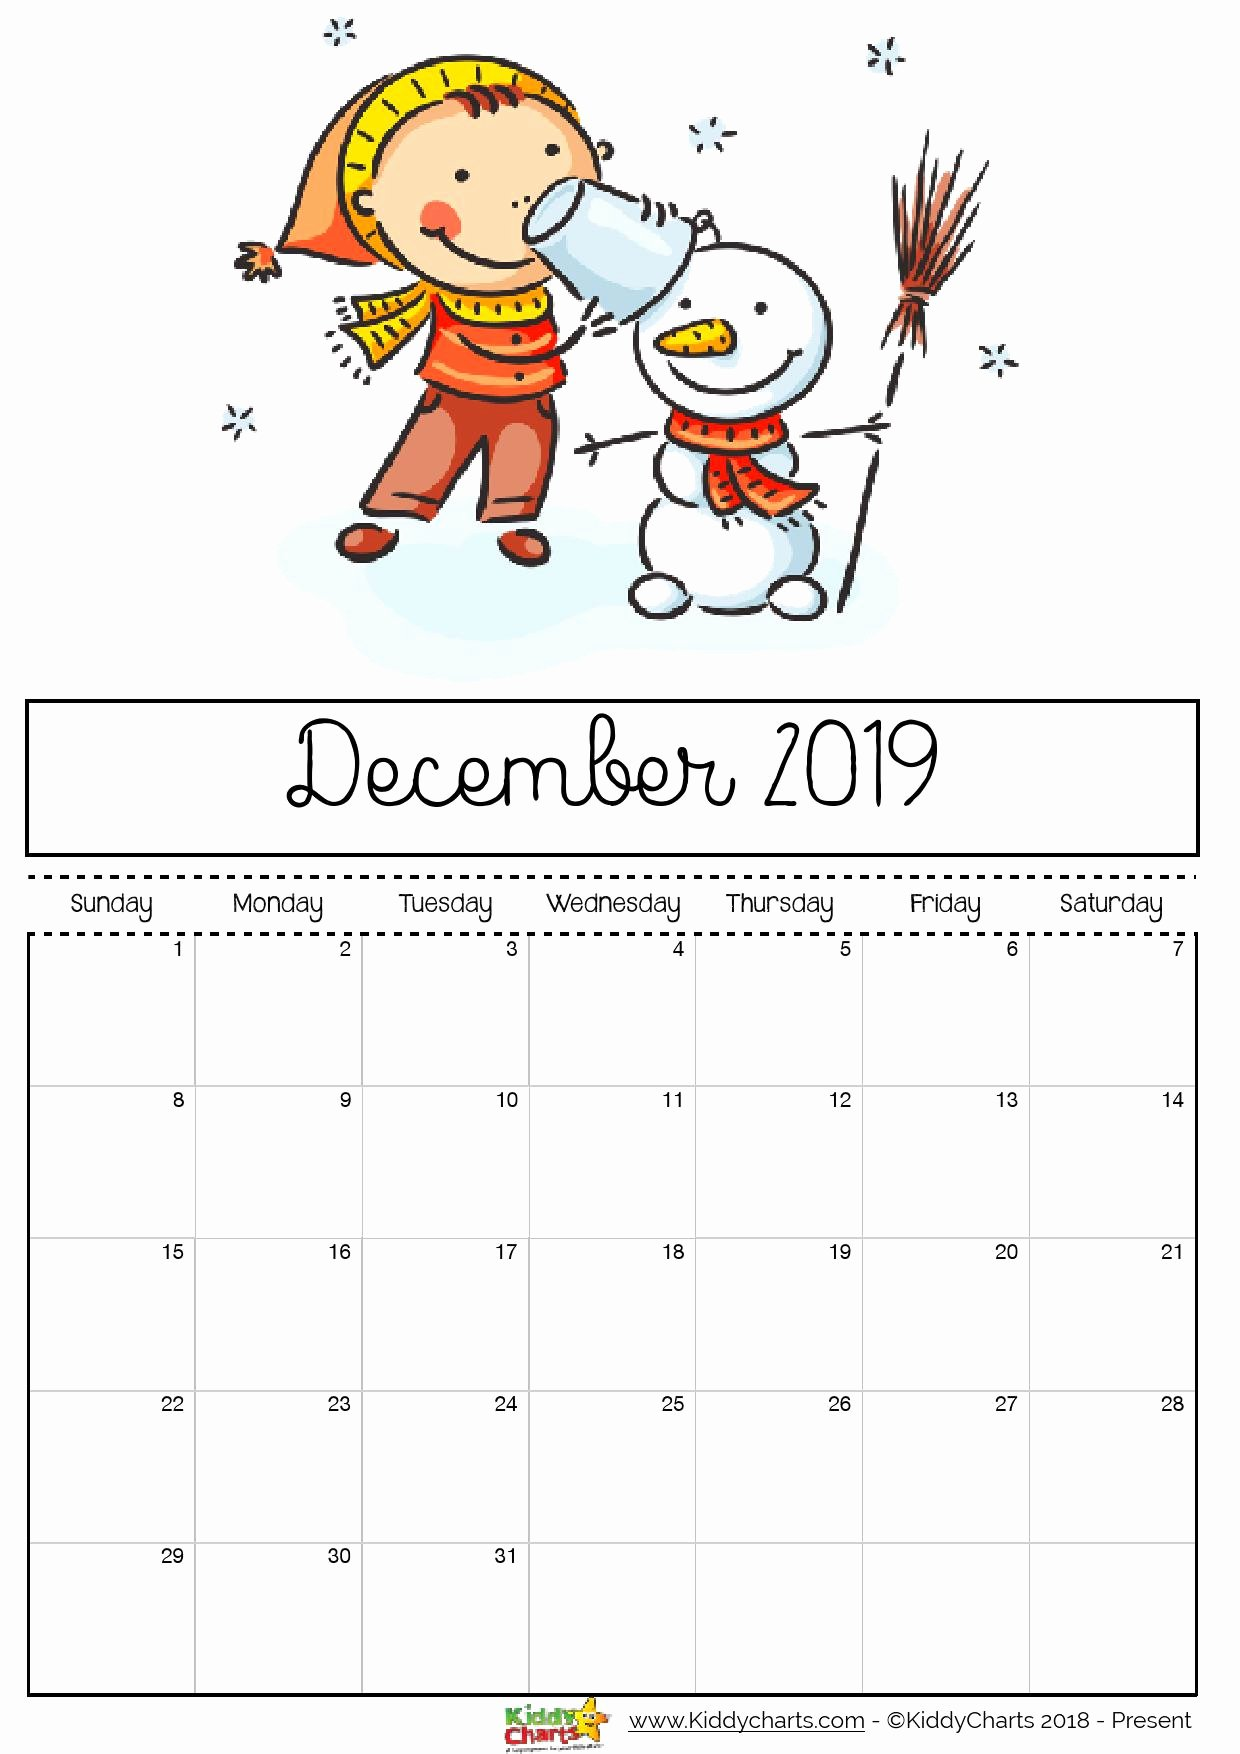 2019 Cute Calendar Printable Luxury Free Printable 2019 Calendar Print Yours Here